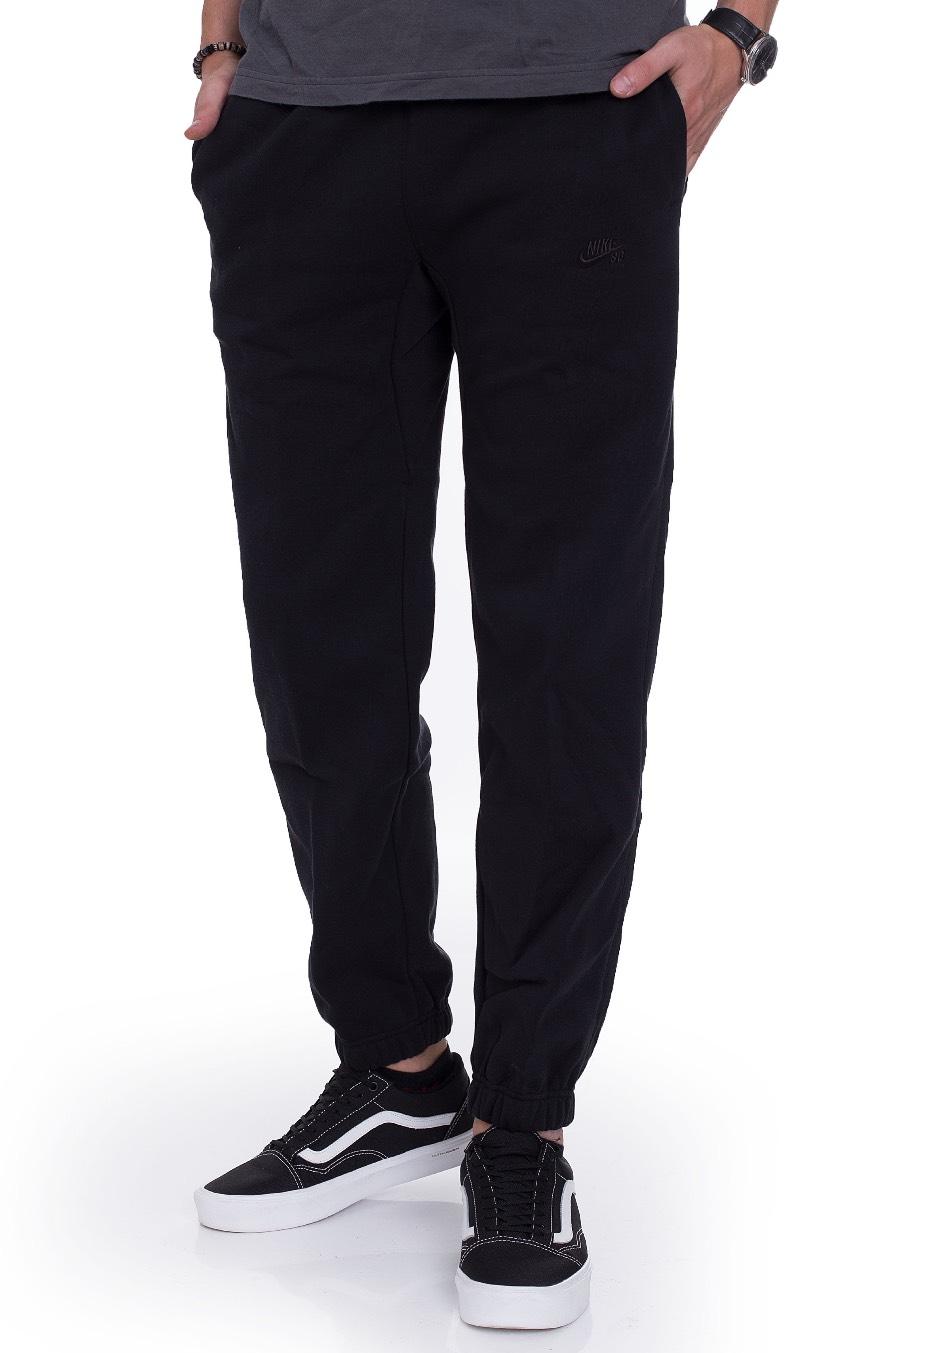 Nike - SB Icon Fleece Black Black - Sweat Pants - Streetwear Shop ... 6806131da730